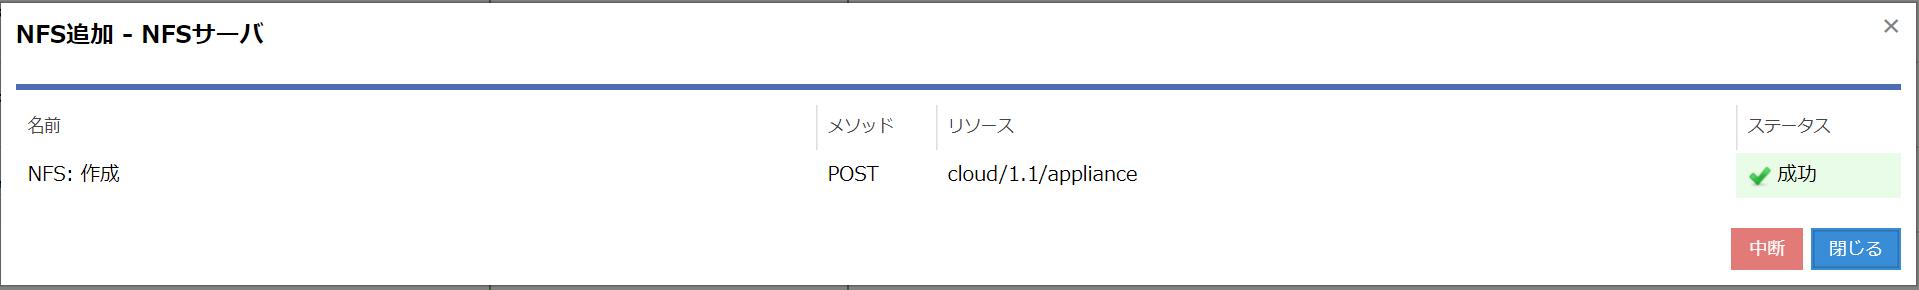 create_bar.png